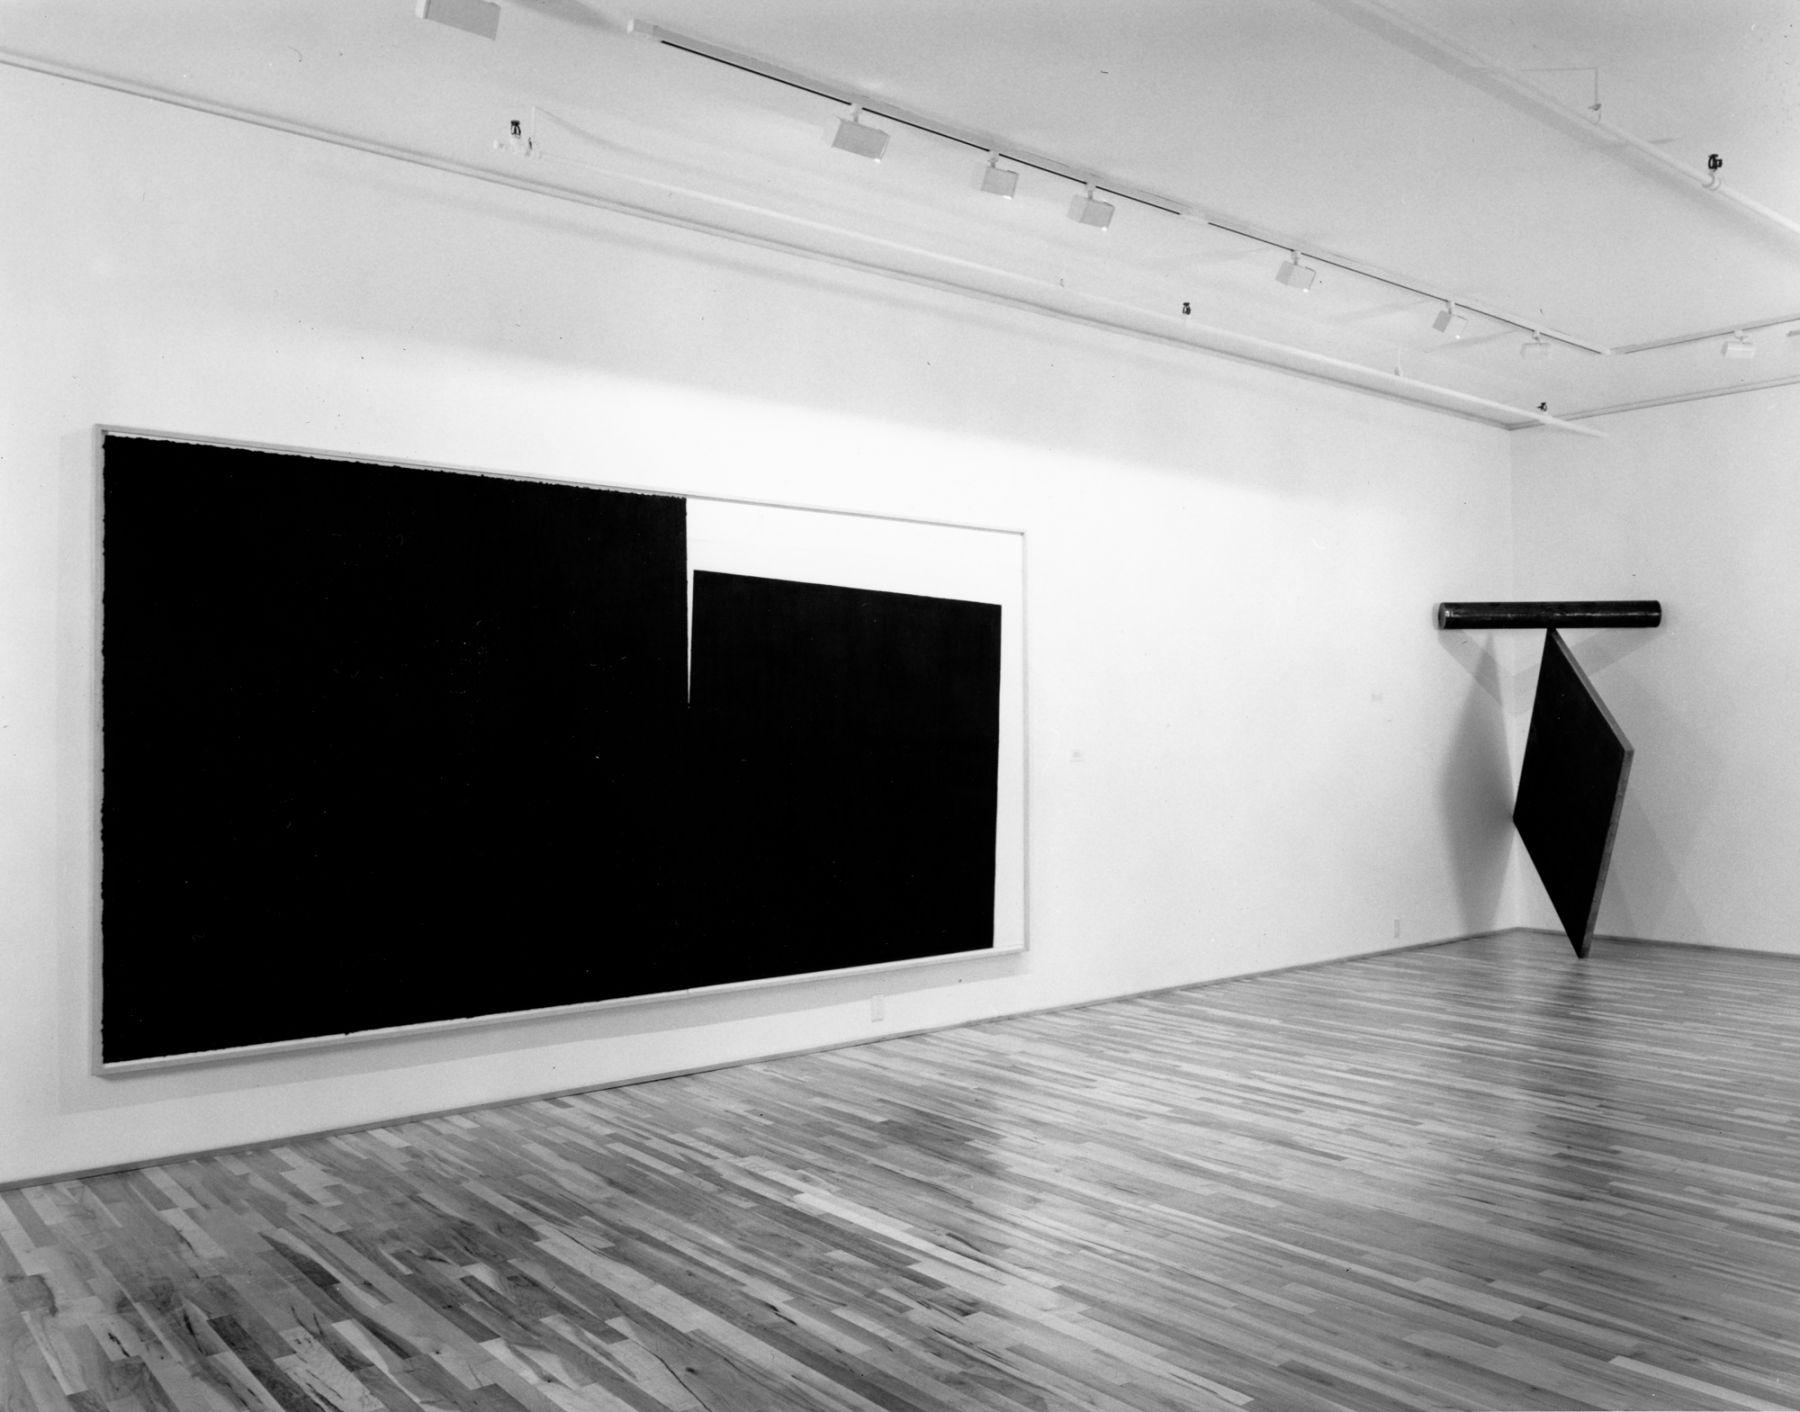 Installation view, Bruce Nauman, Richard Serra, 578 BROADWAY.